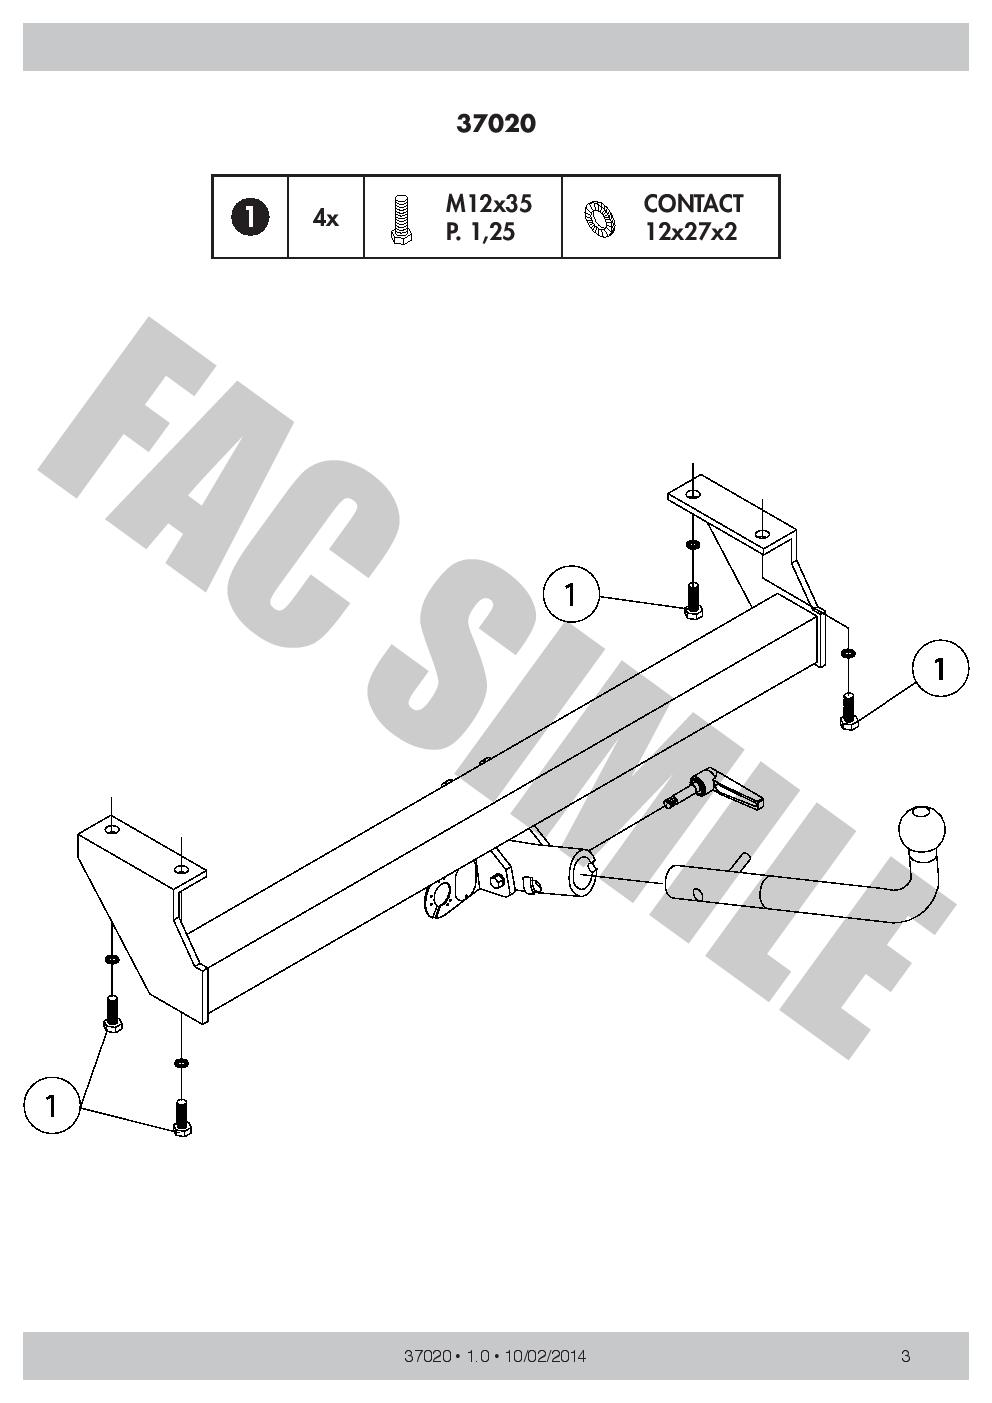 Detach Towbar 13pin C2 Wiring For Suzuki Grand Vitara 4wd Cabrio Diagram Daihatsu Max